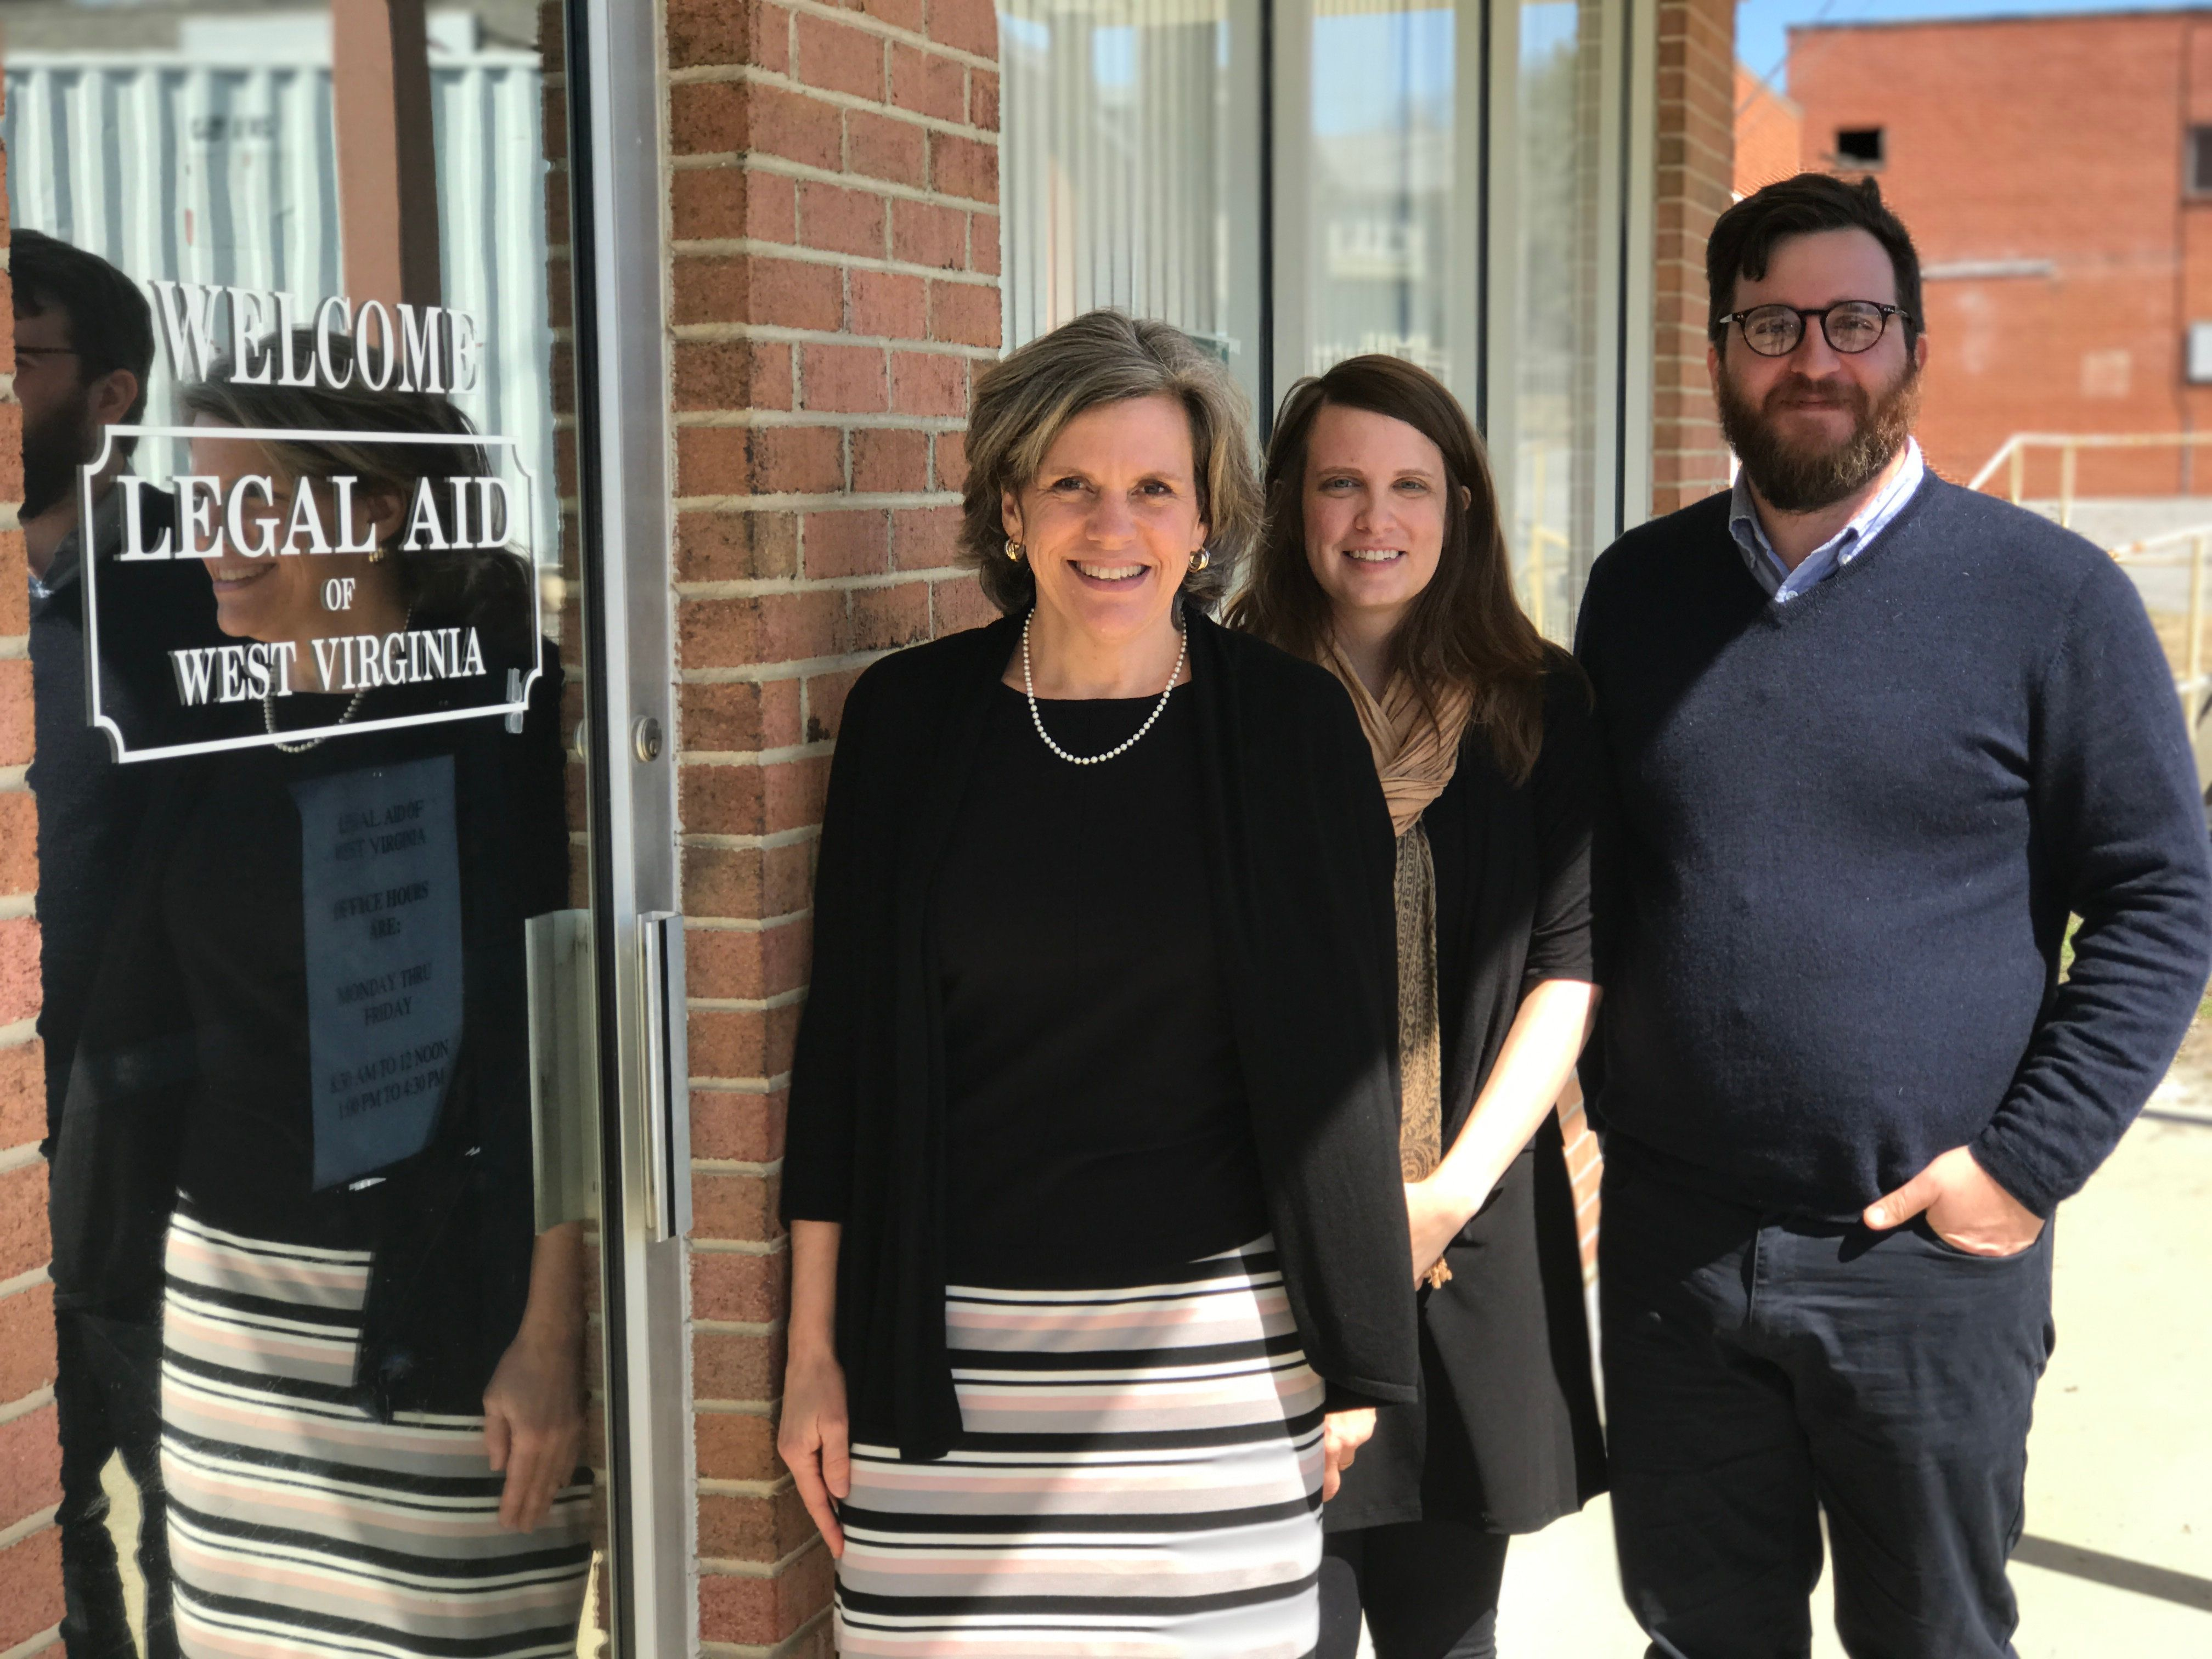 Kelly Beck Eriin Clark and Matthew Jividen staff Legal Aid of West Virginias Martinsburg office